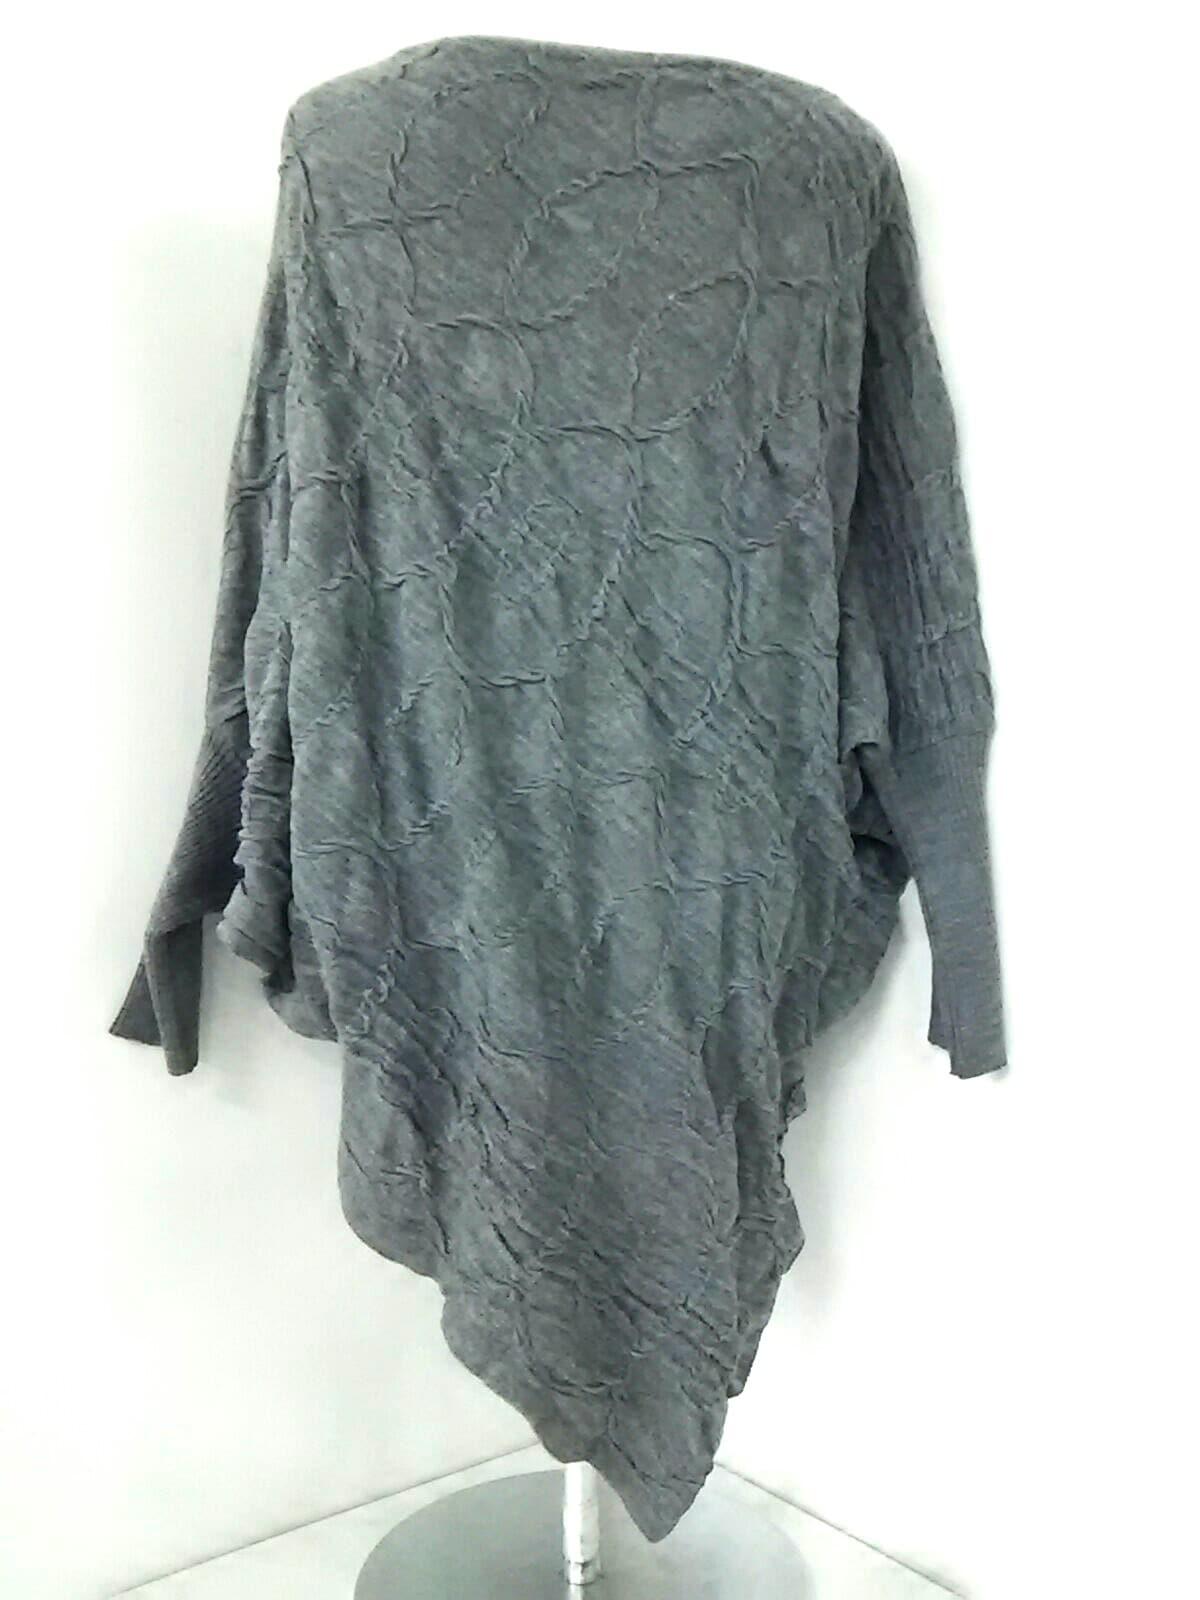 SANDRO FERRONE(サンドロフェローネ)のセーター